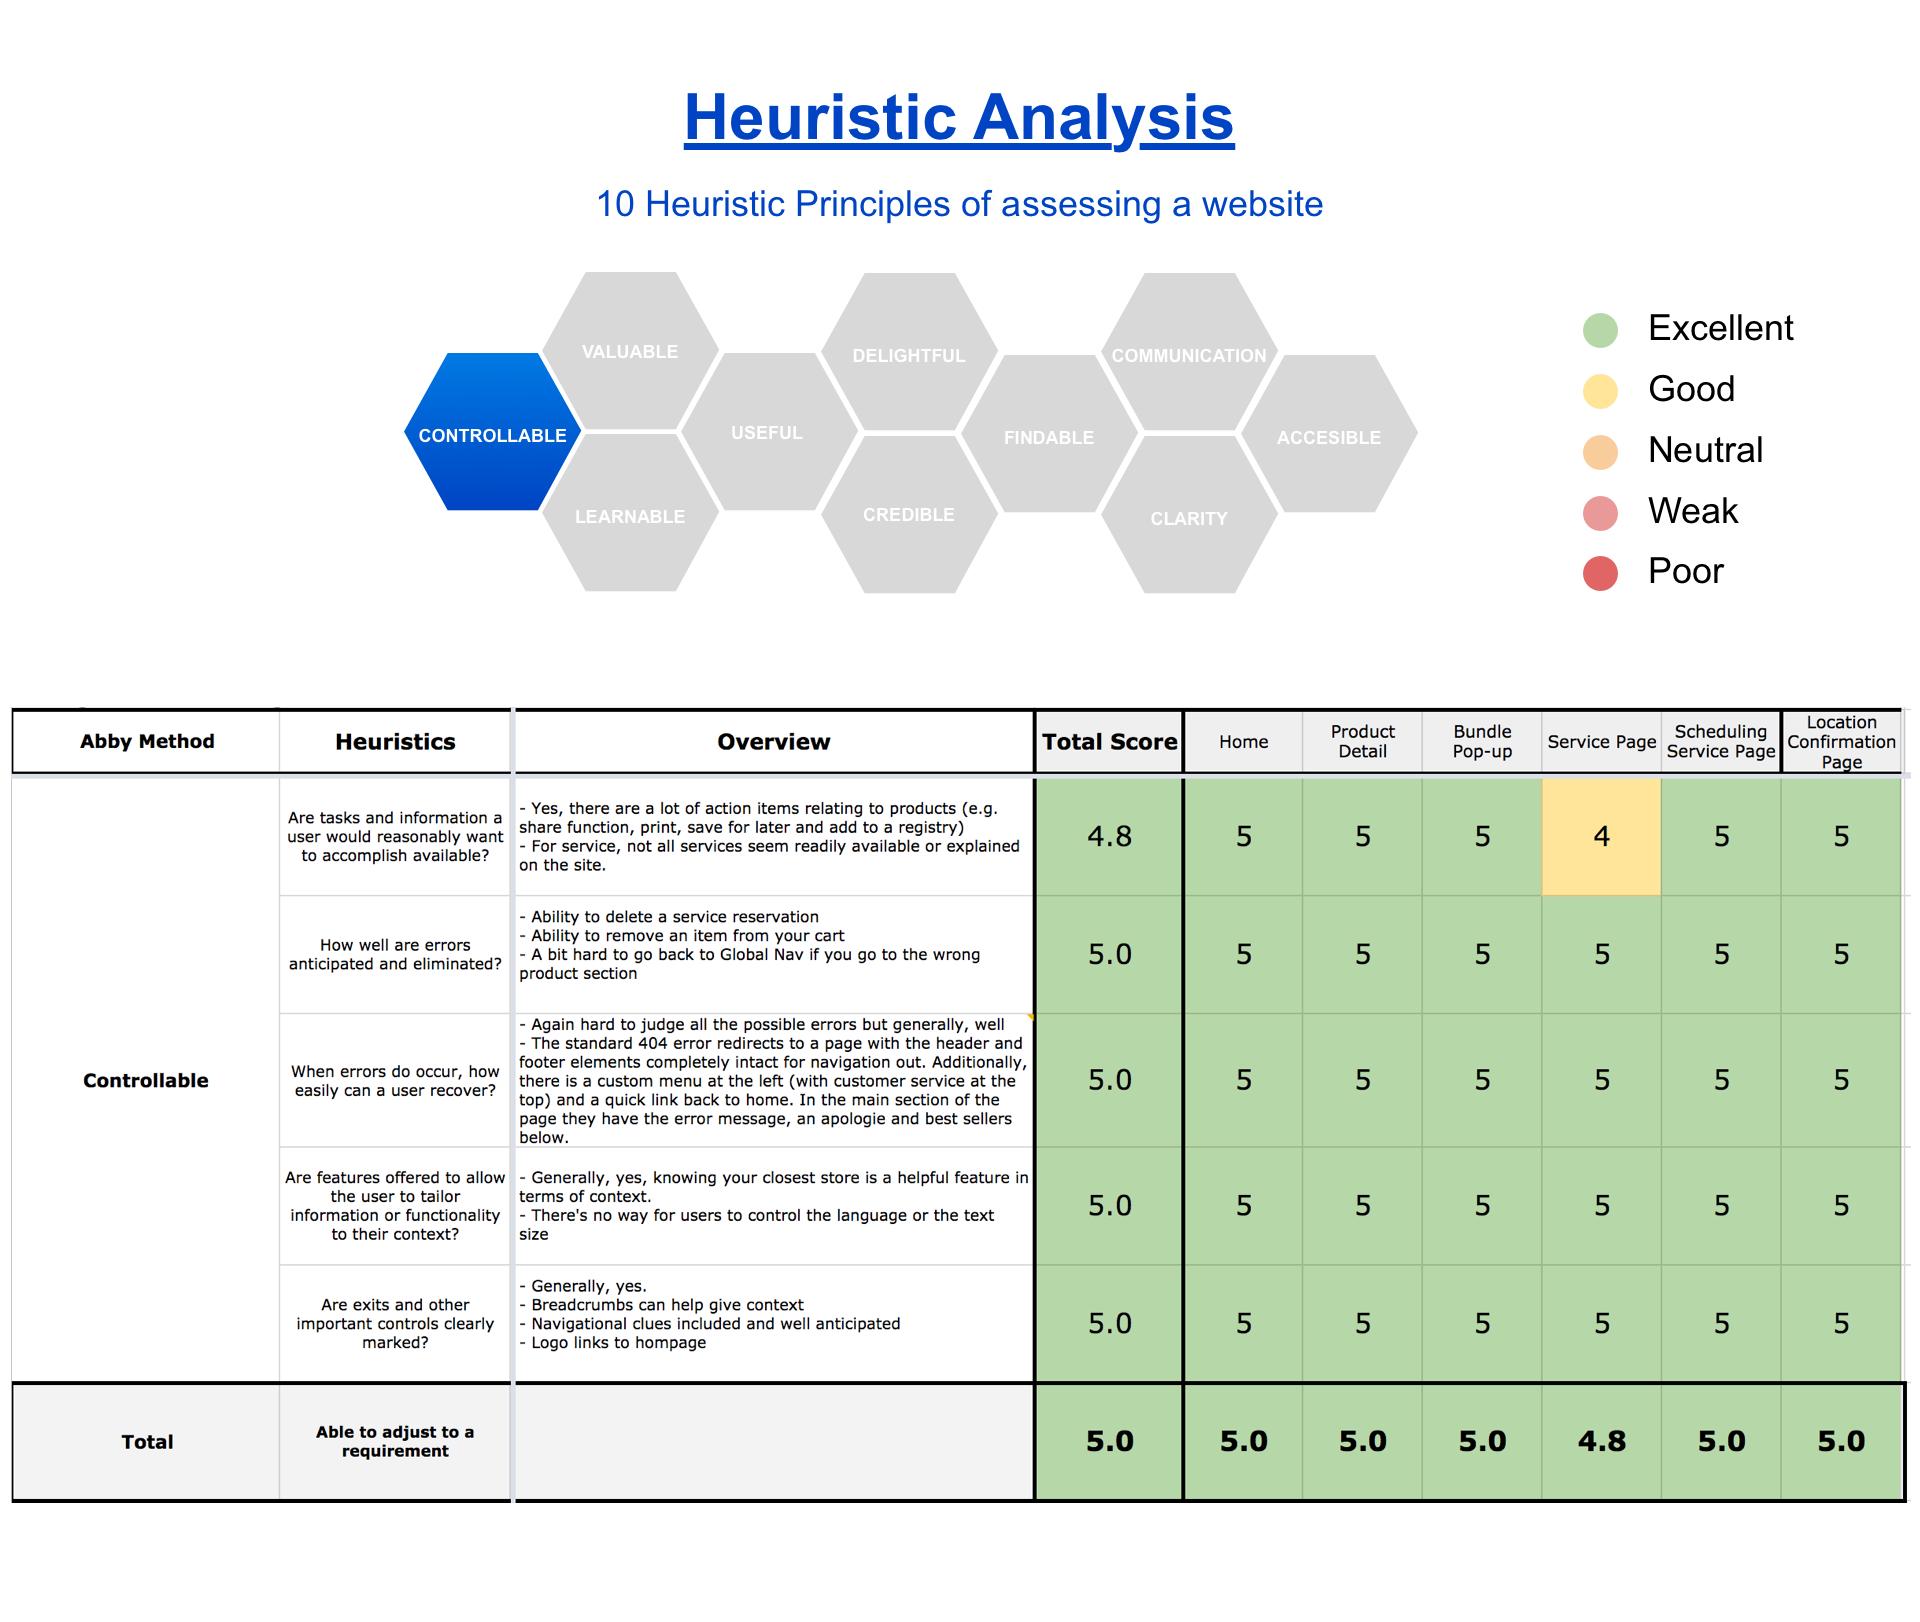 heuristics 1.png